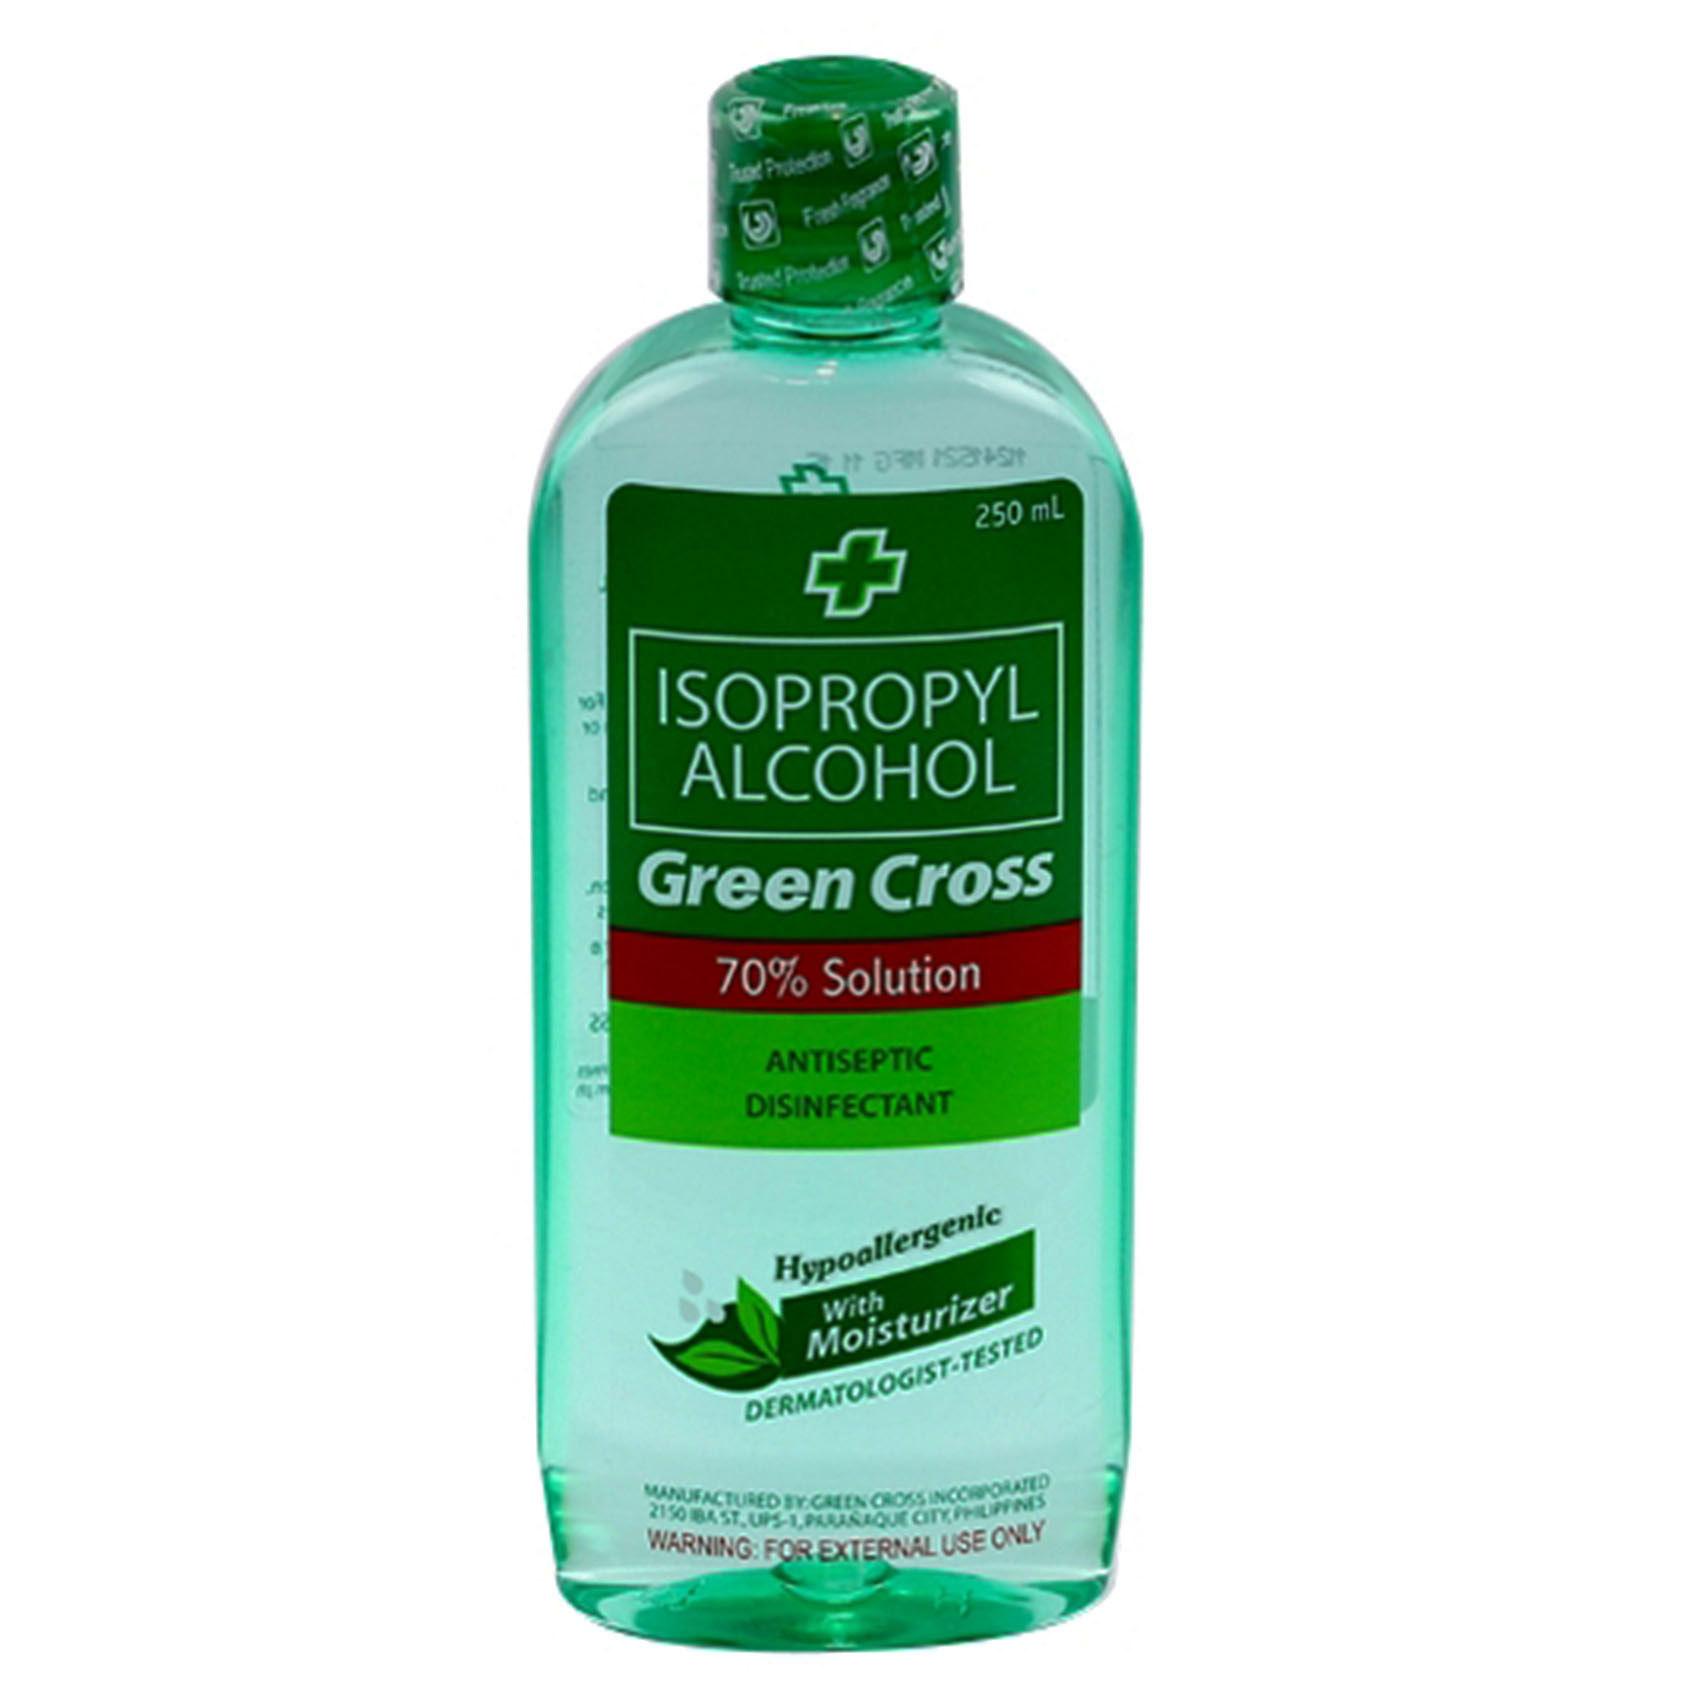 ISOPROPYL ALCOHOL 70% MOIST 250M